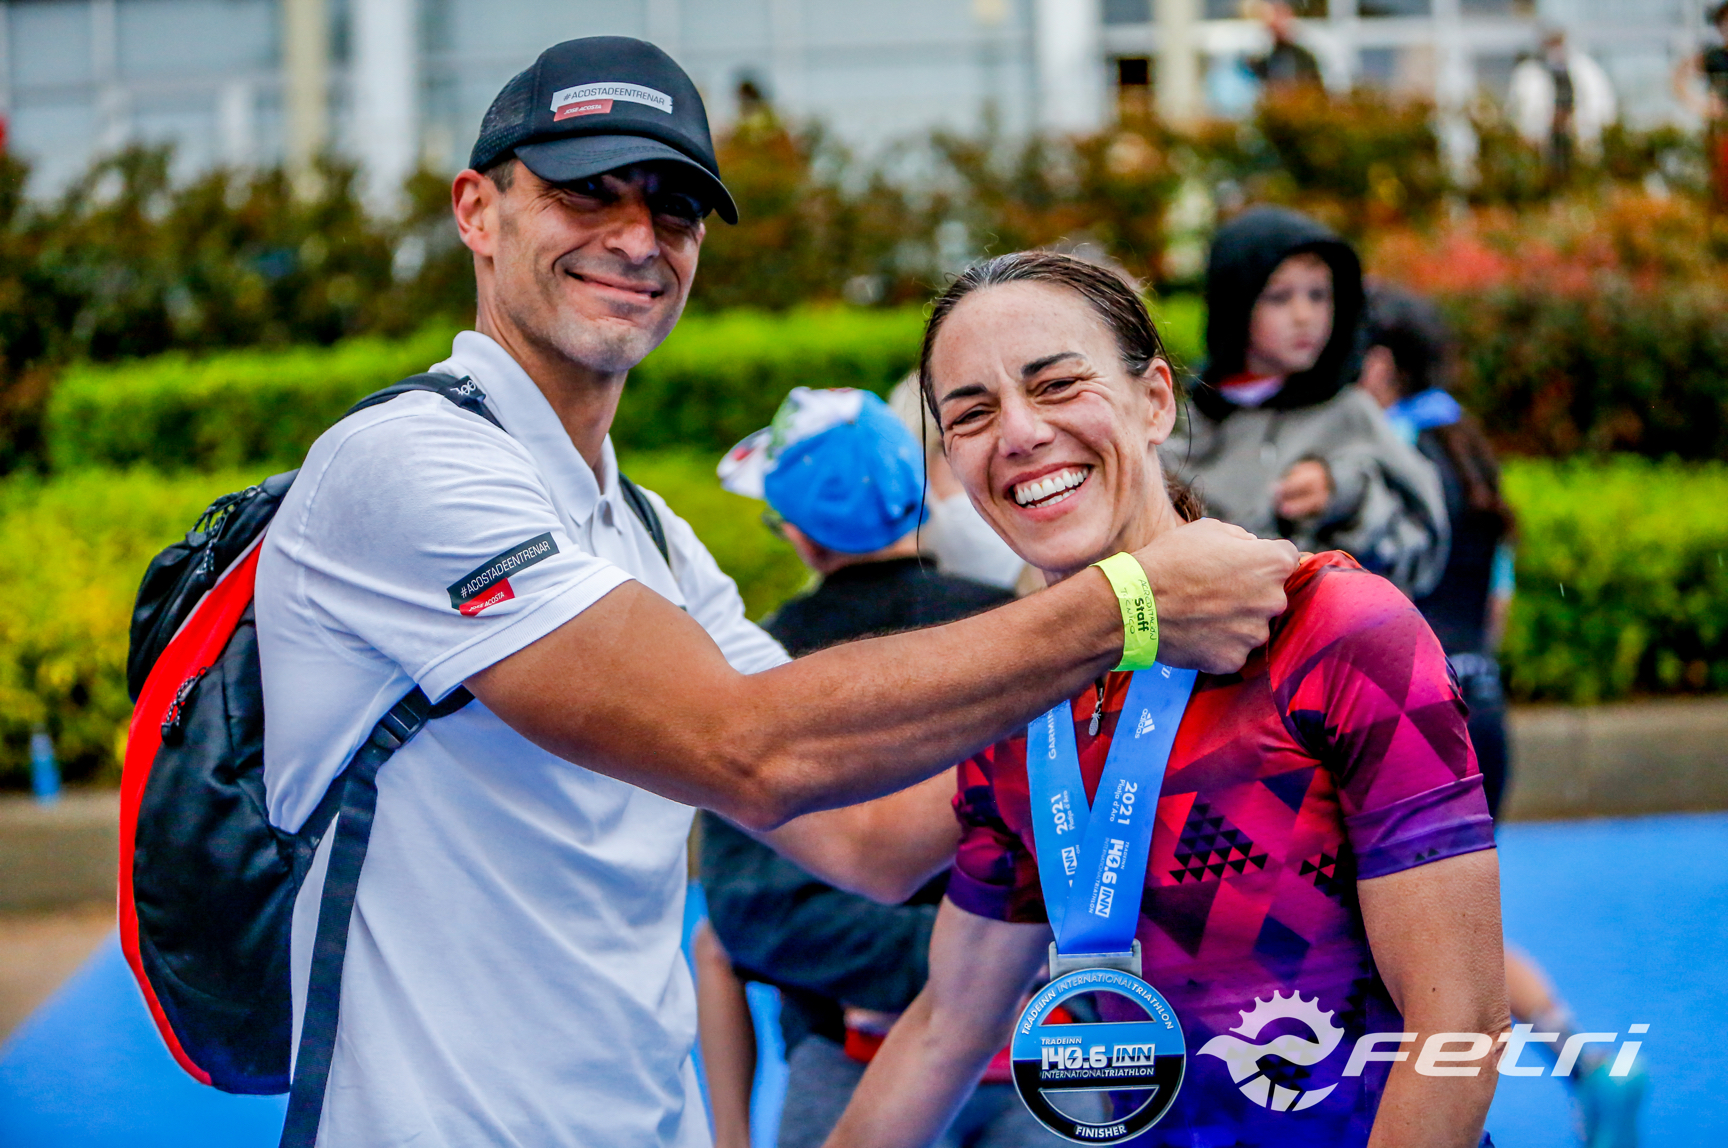 140.6 tradeinn international fetri Isabel del barrio onmytrainingshoes triatleta triatlón triathlete